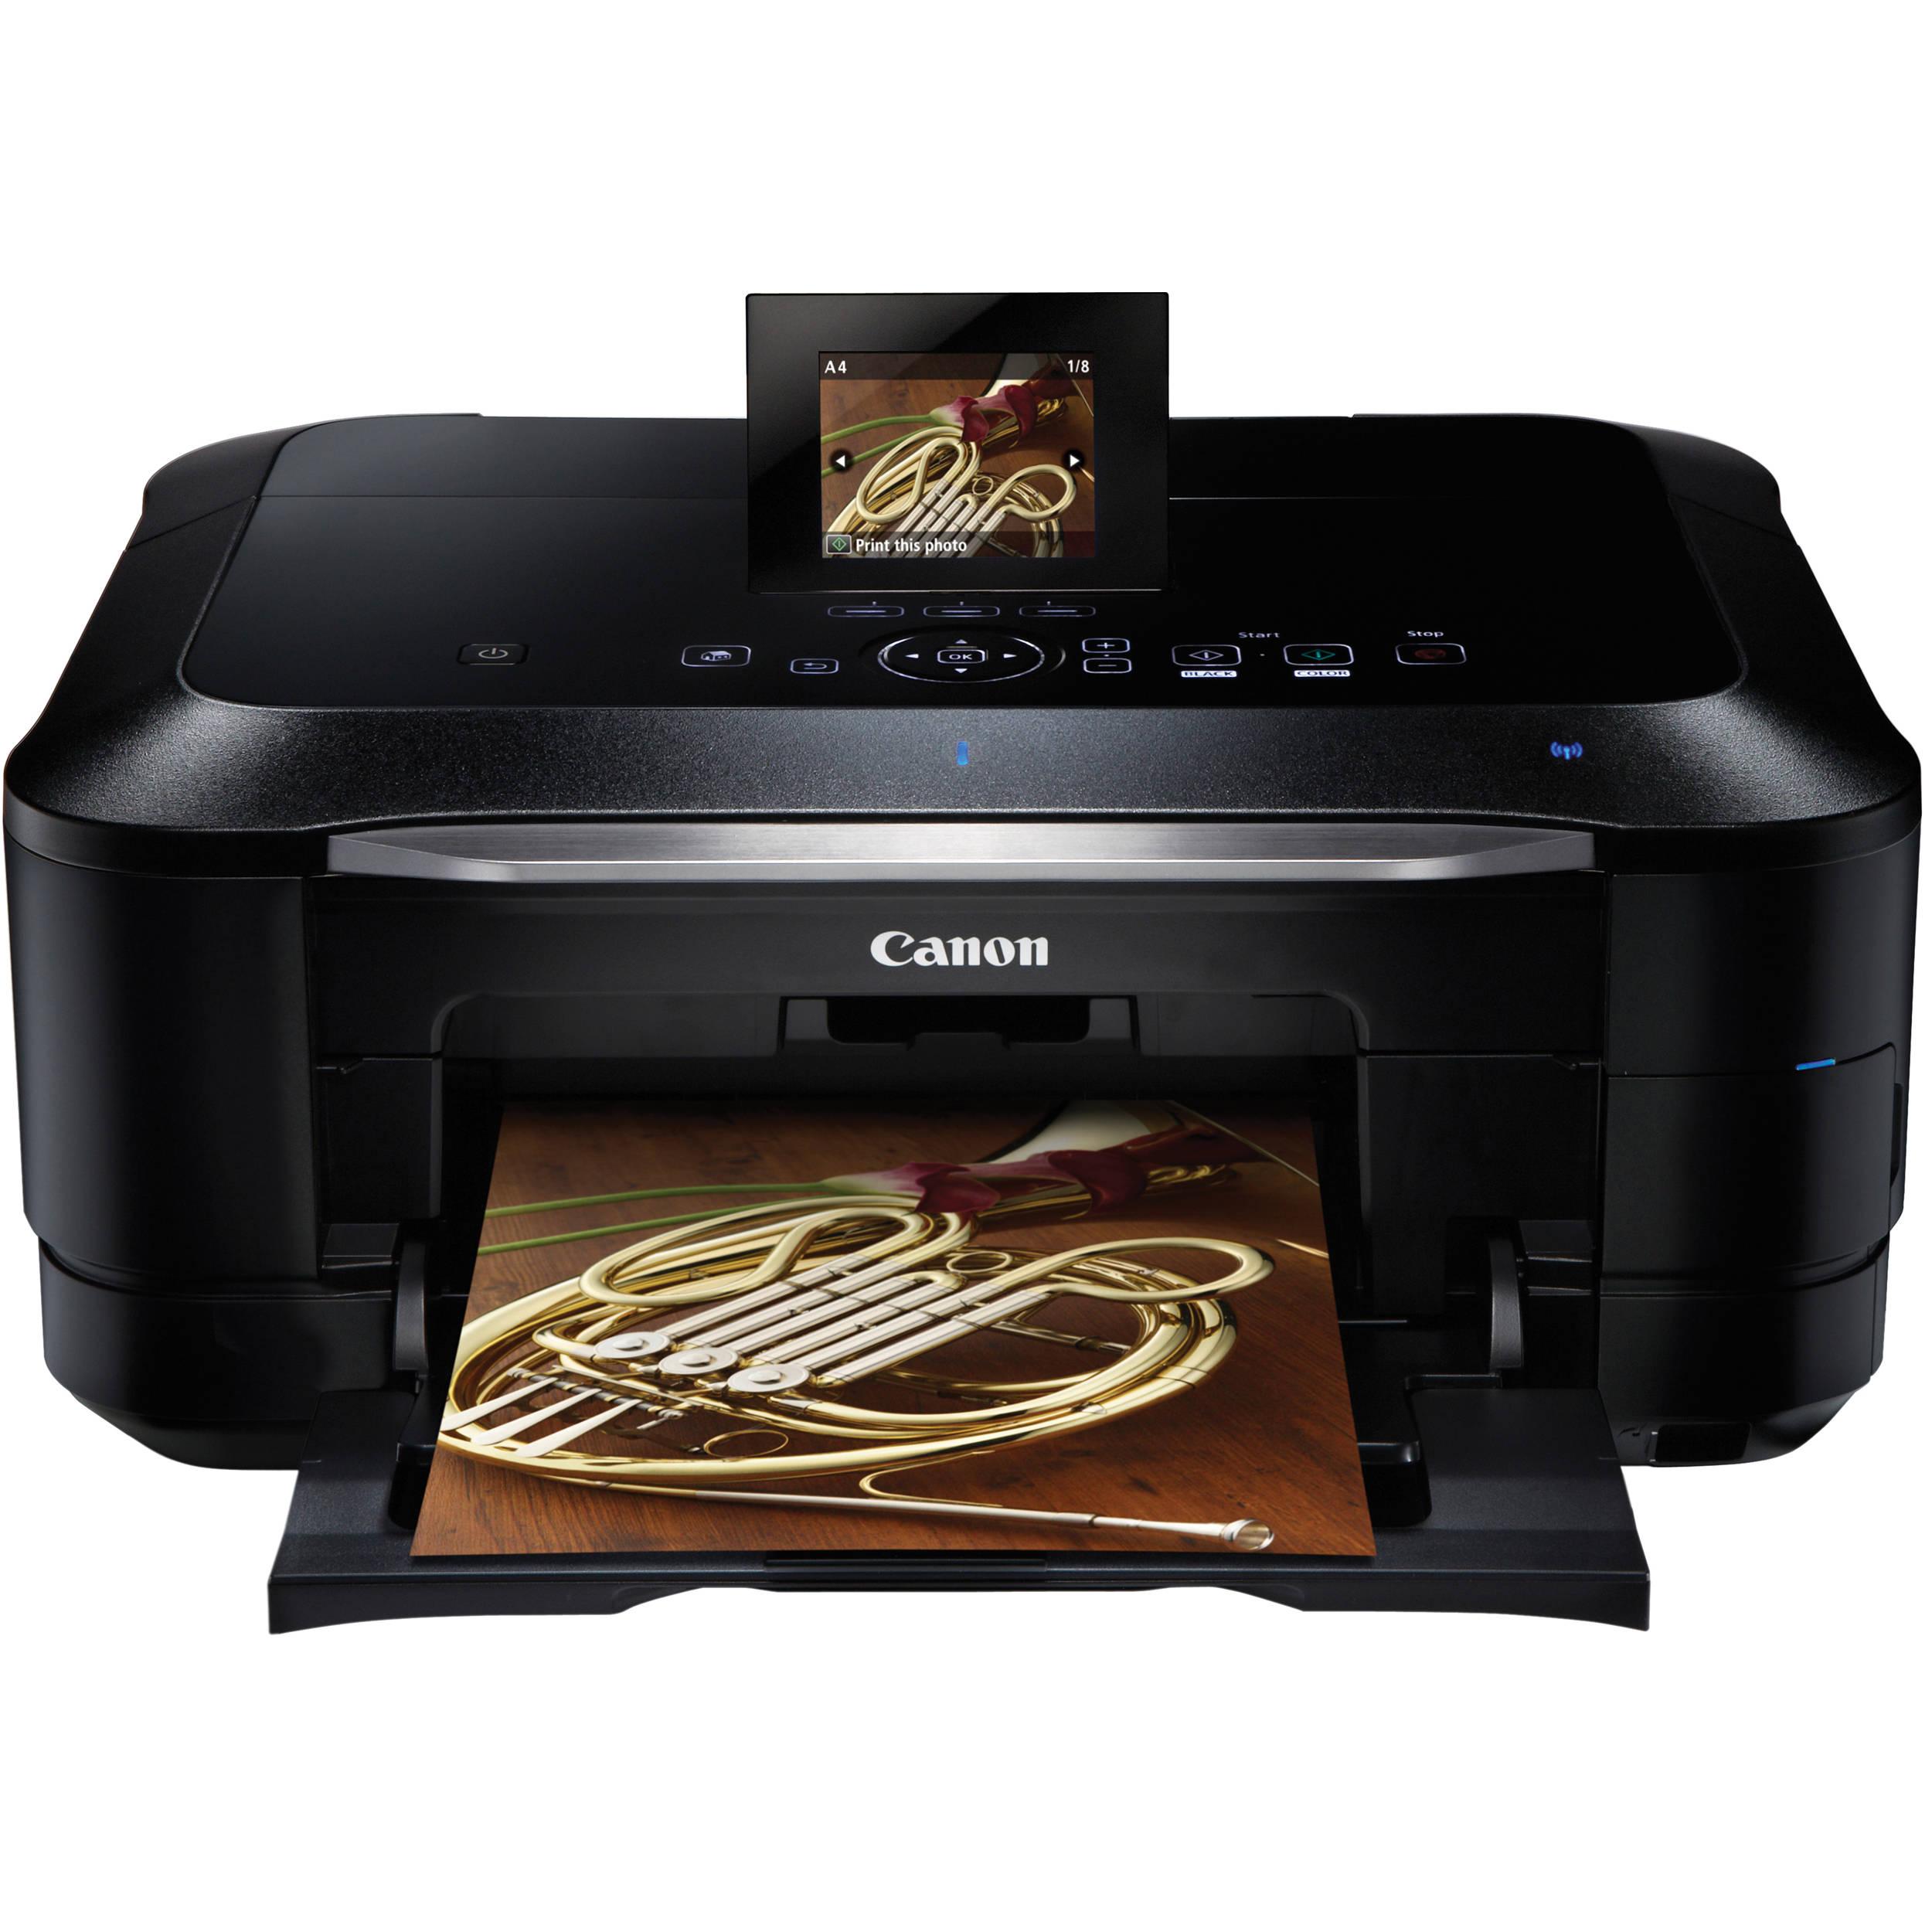 Color printing bu - Canon Pixma Mg8220 Wireless Color All In One Inkjet Photo Printer